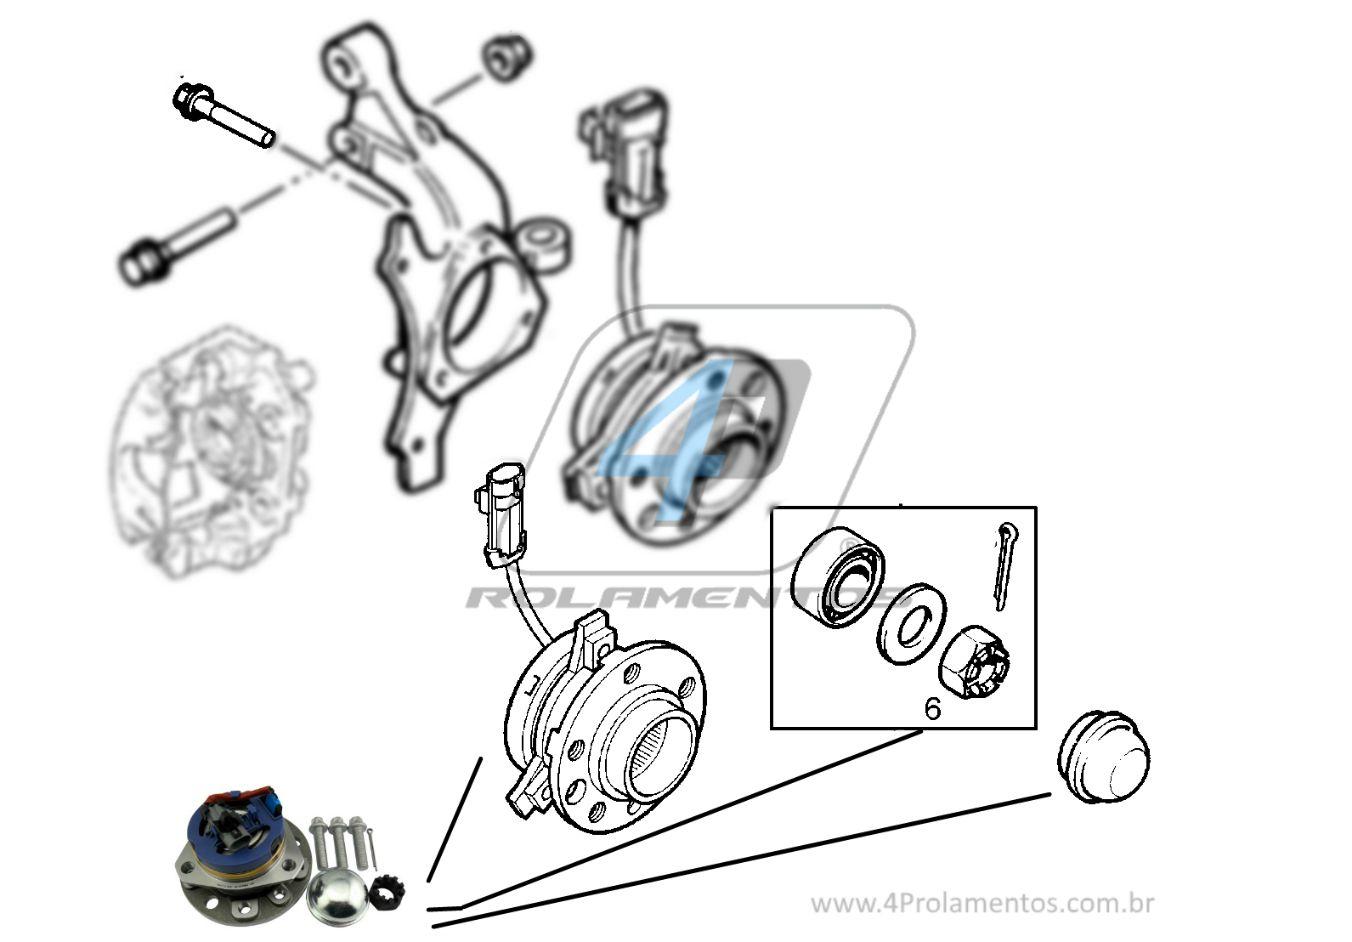 Cubo de Roda Dianteira CHEVROLET Vectra 2006 até 2011 5 Furos, com ABS,